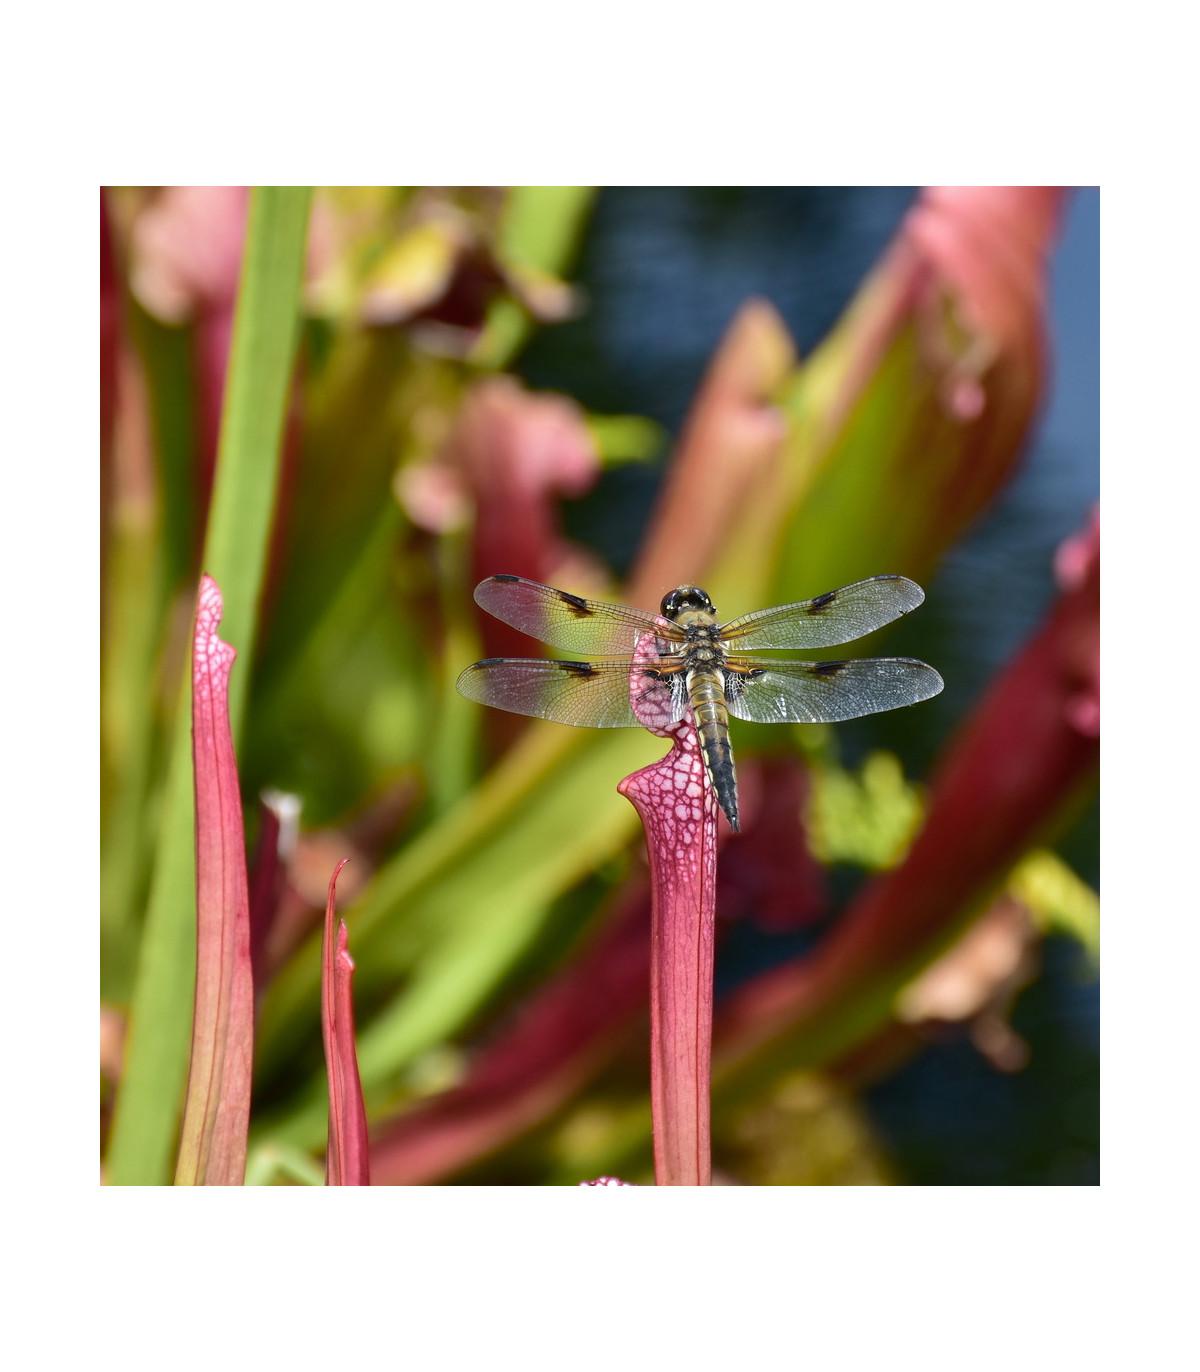 Špirlice přivřená - masožravka Sarracenia minor - prodej semen špirlice - 12 ks